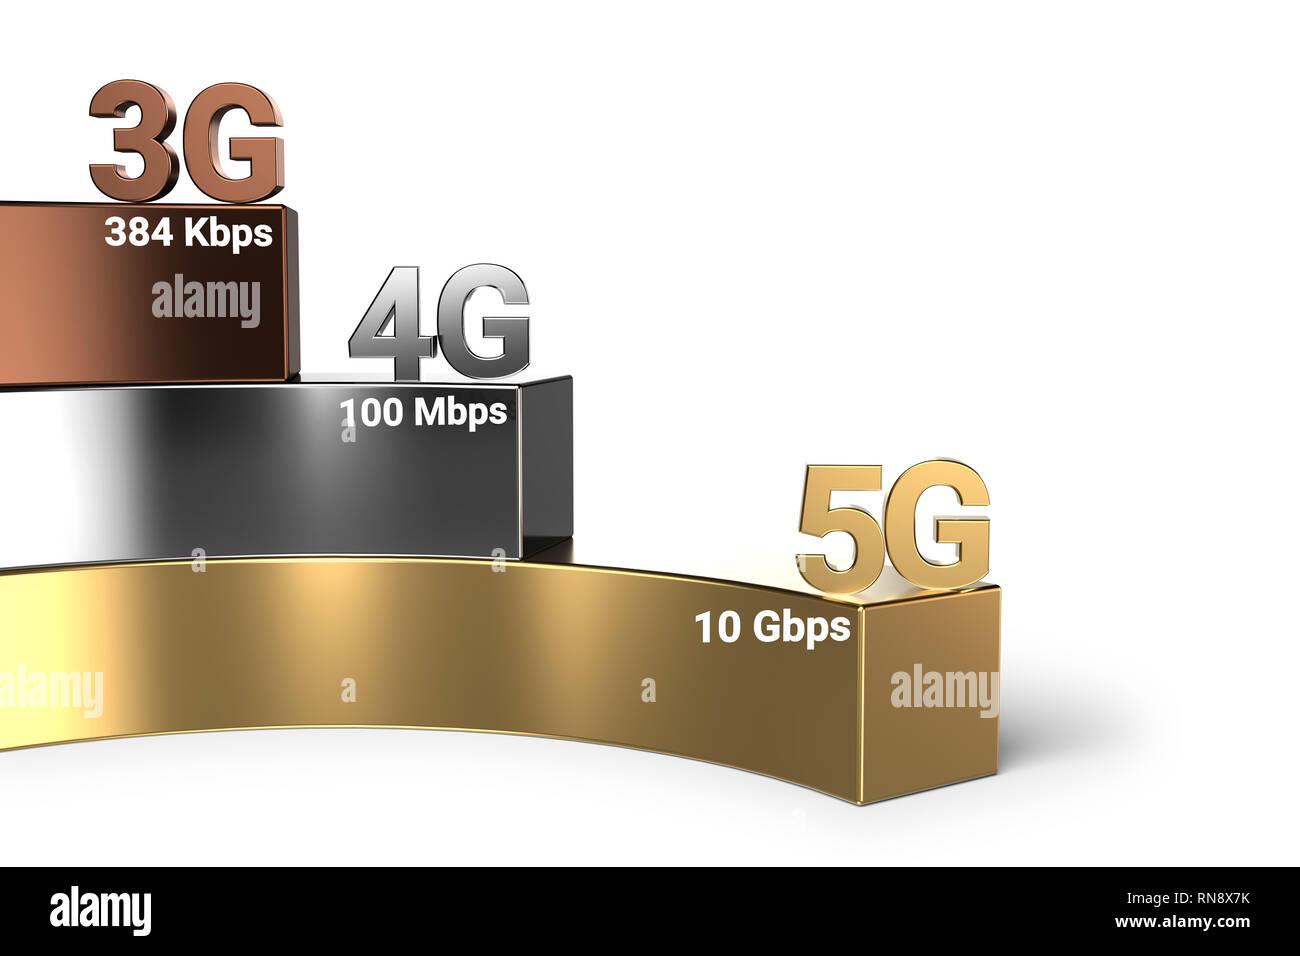 Wireless network speed evolution from 3G through 4G to 5G